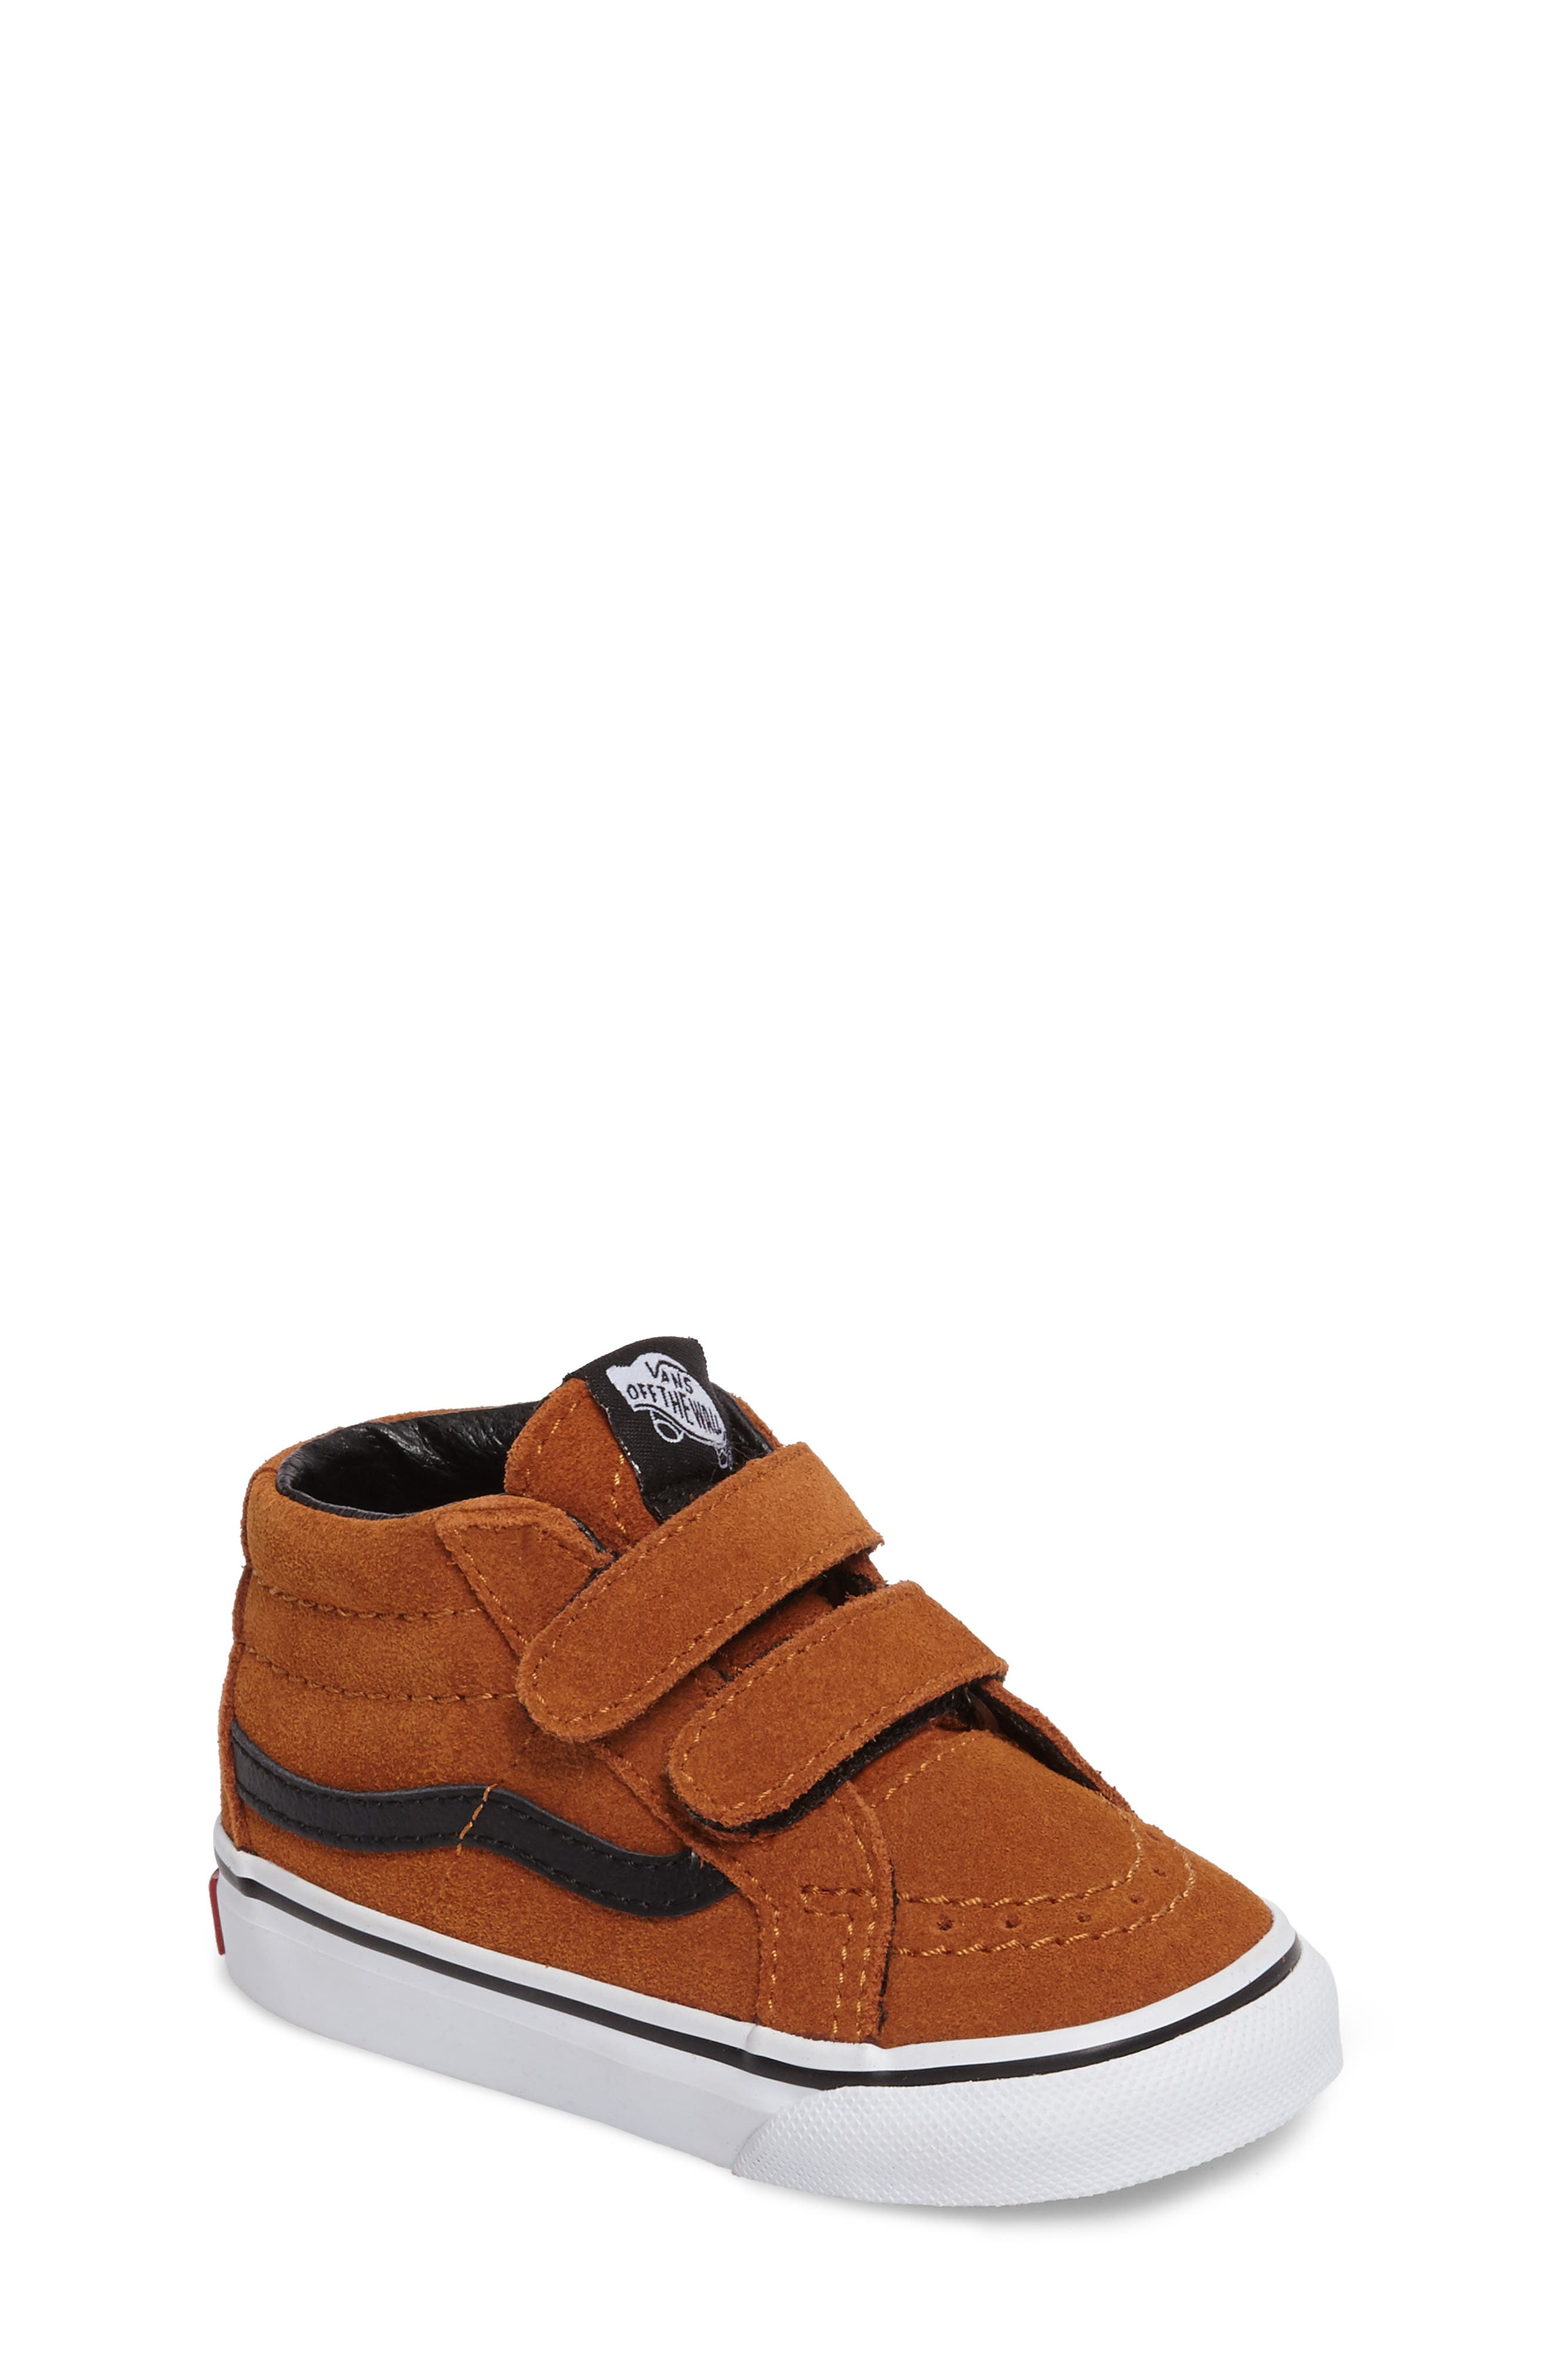 SK8-Mid Reissue Sneaker,                         Main,                         color, 200